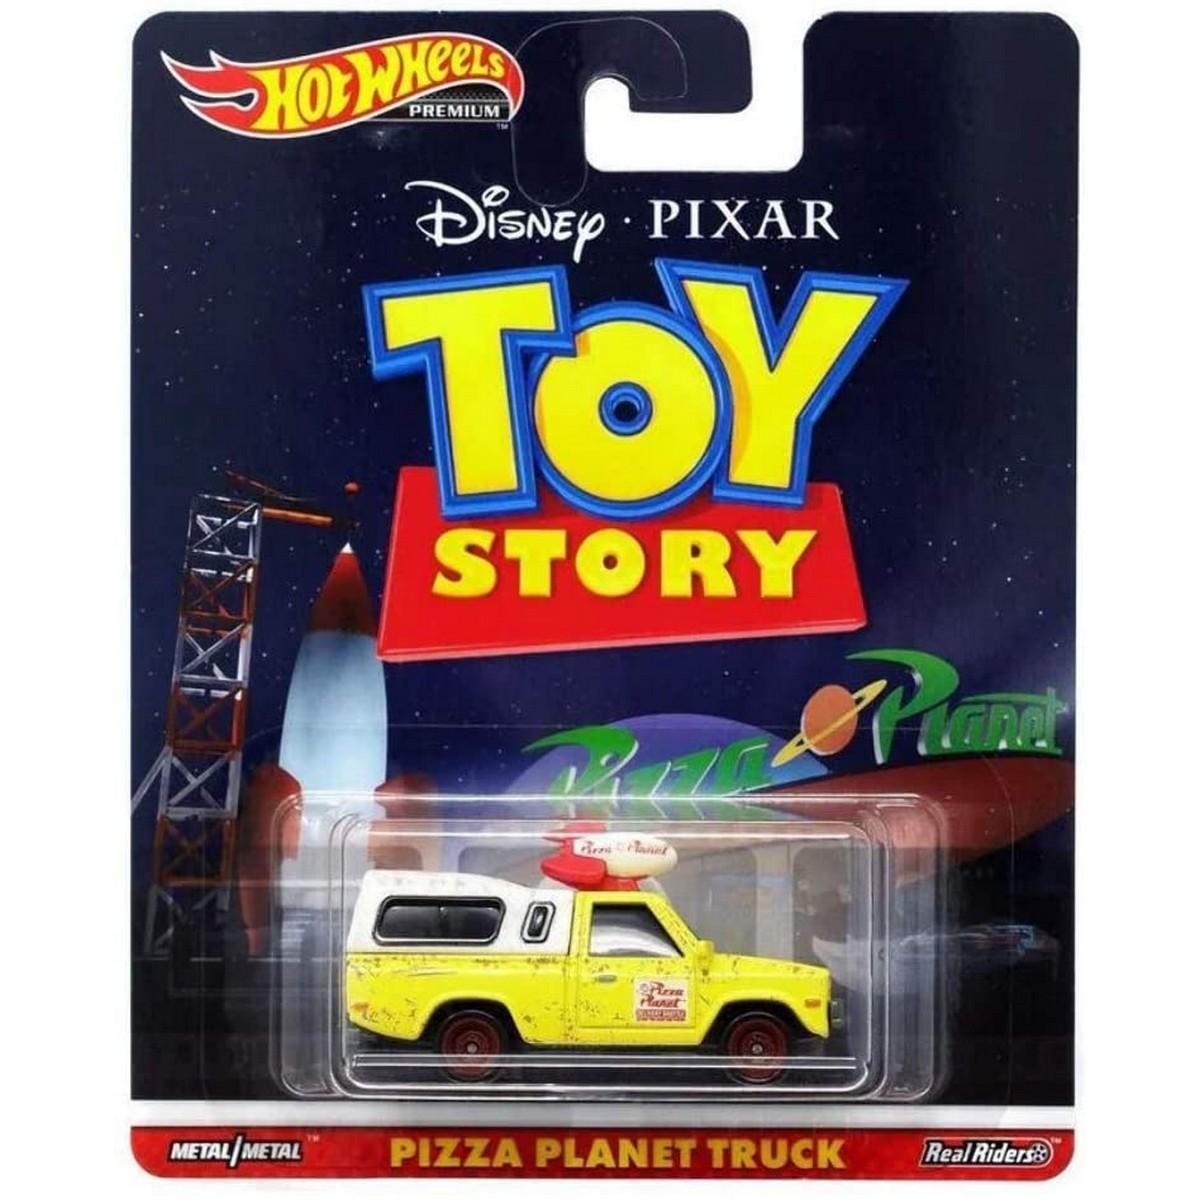 Hot Wheels Premium Pizza Planet truck Diecast Vehicle